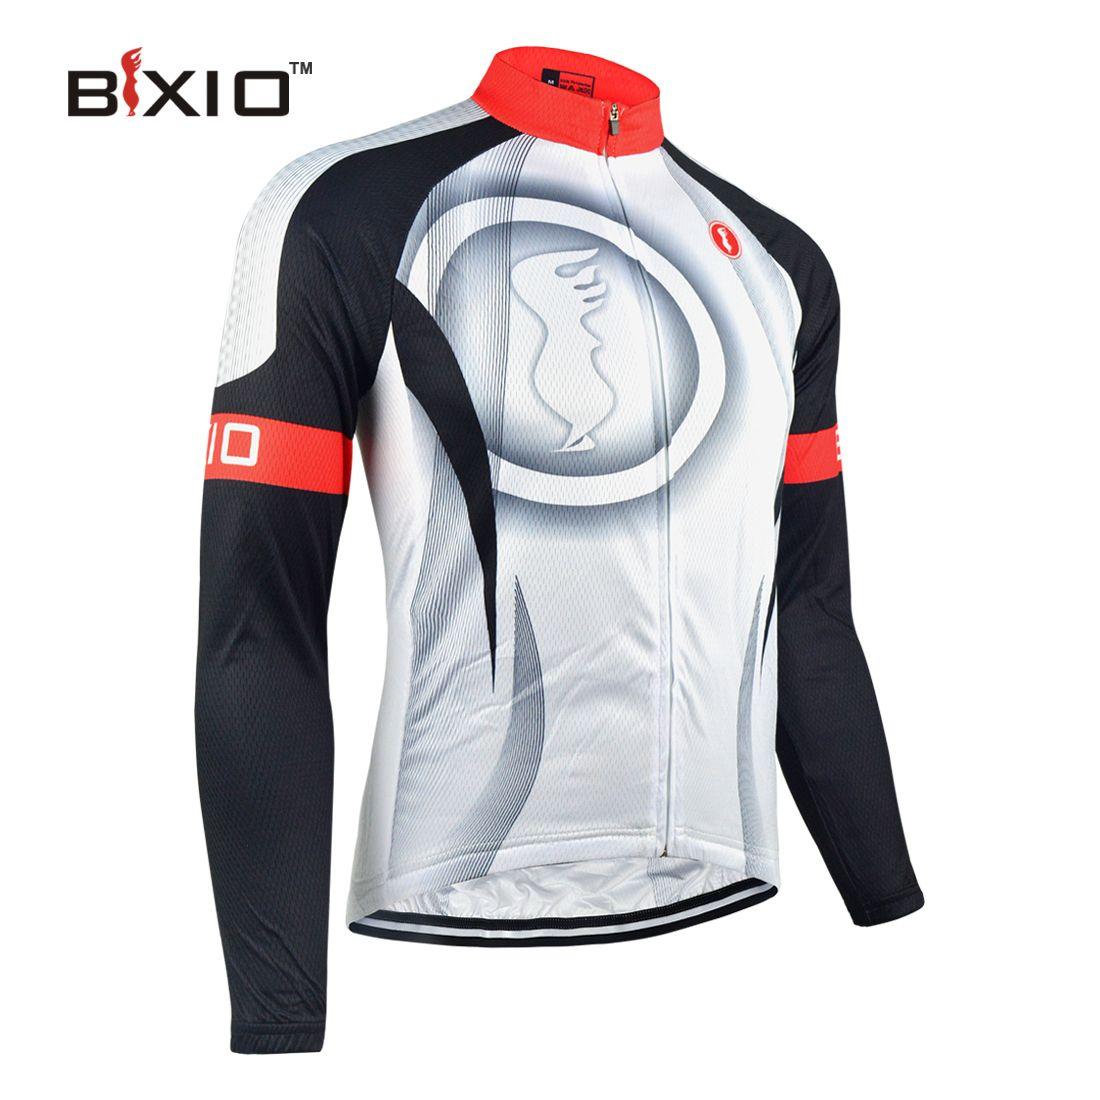 Bxio Winter Thermal Fleece Cycling Jersey Only Pro Bike Jersey Warm ... df1d447a6